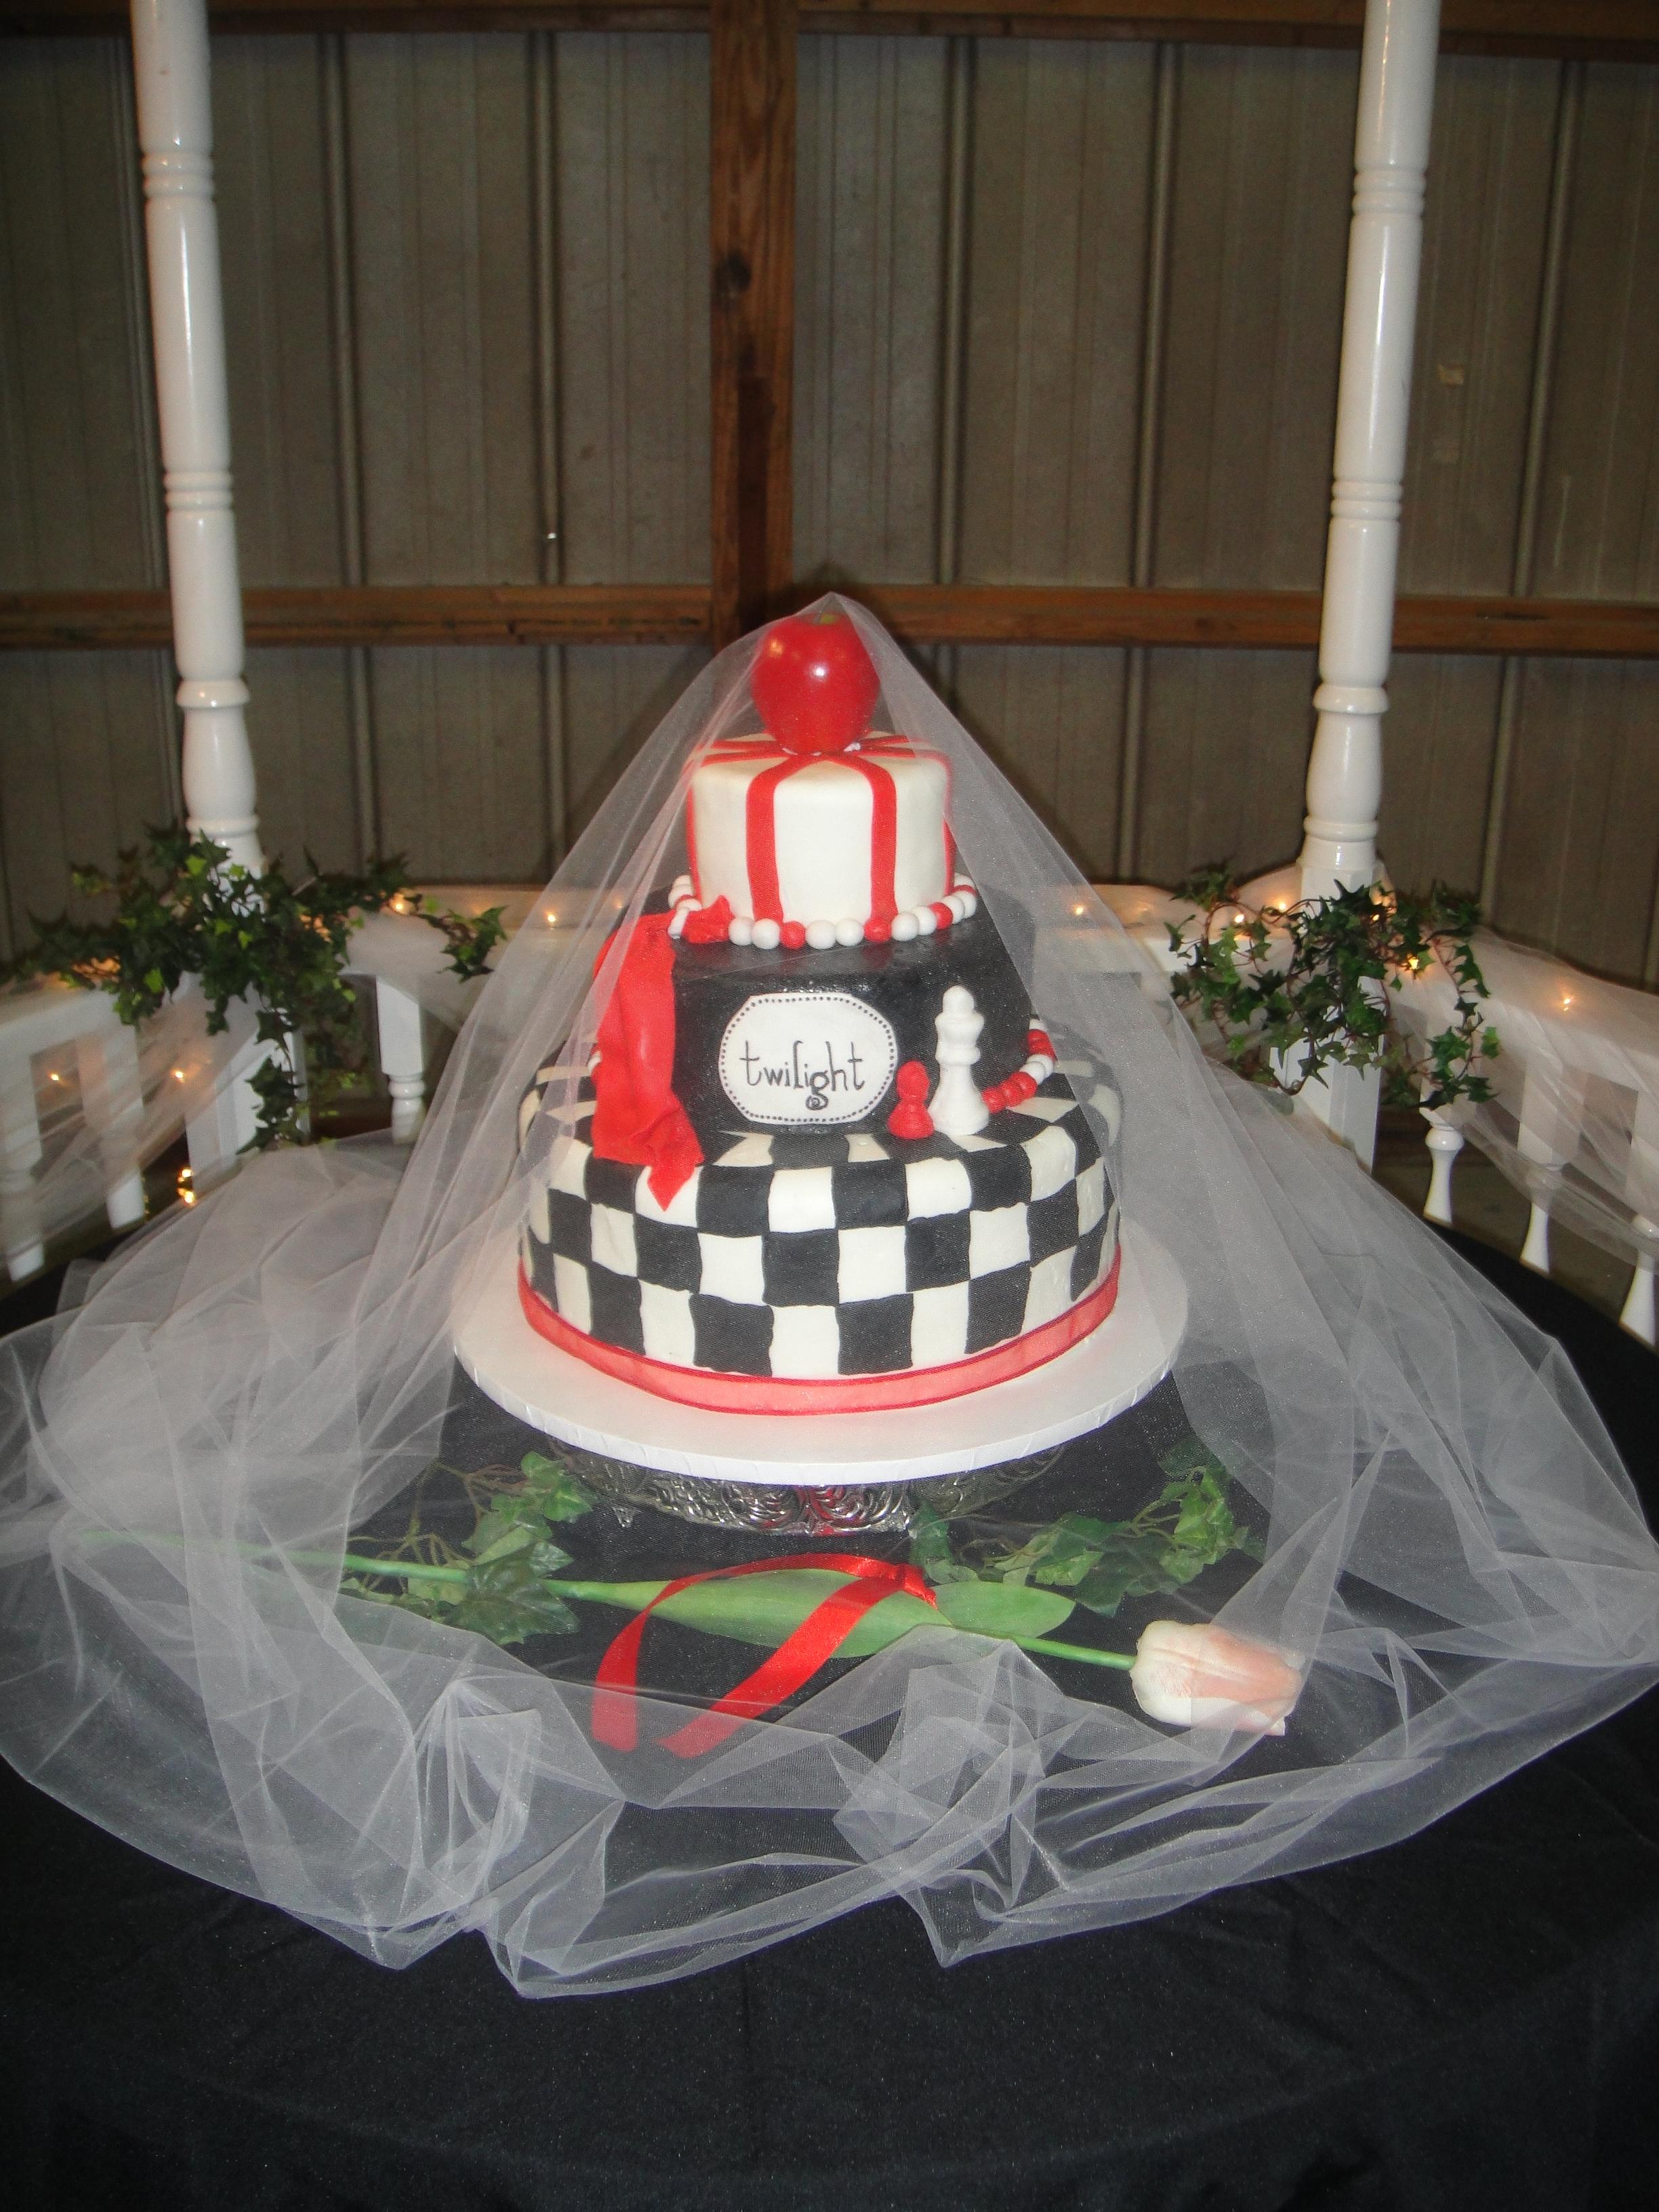 Pin Edward Twilight Cake Ideas And Designs